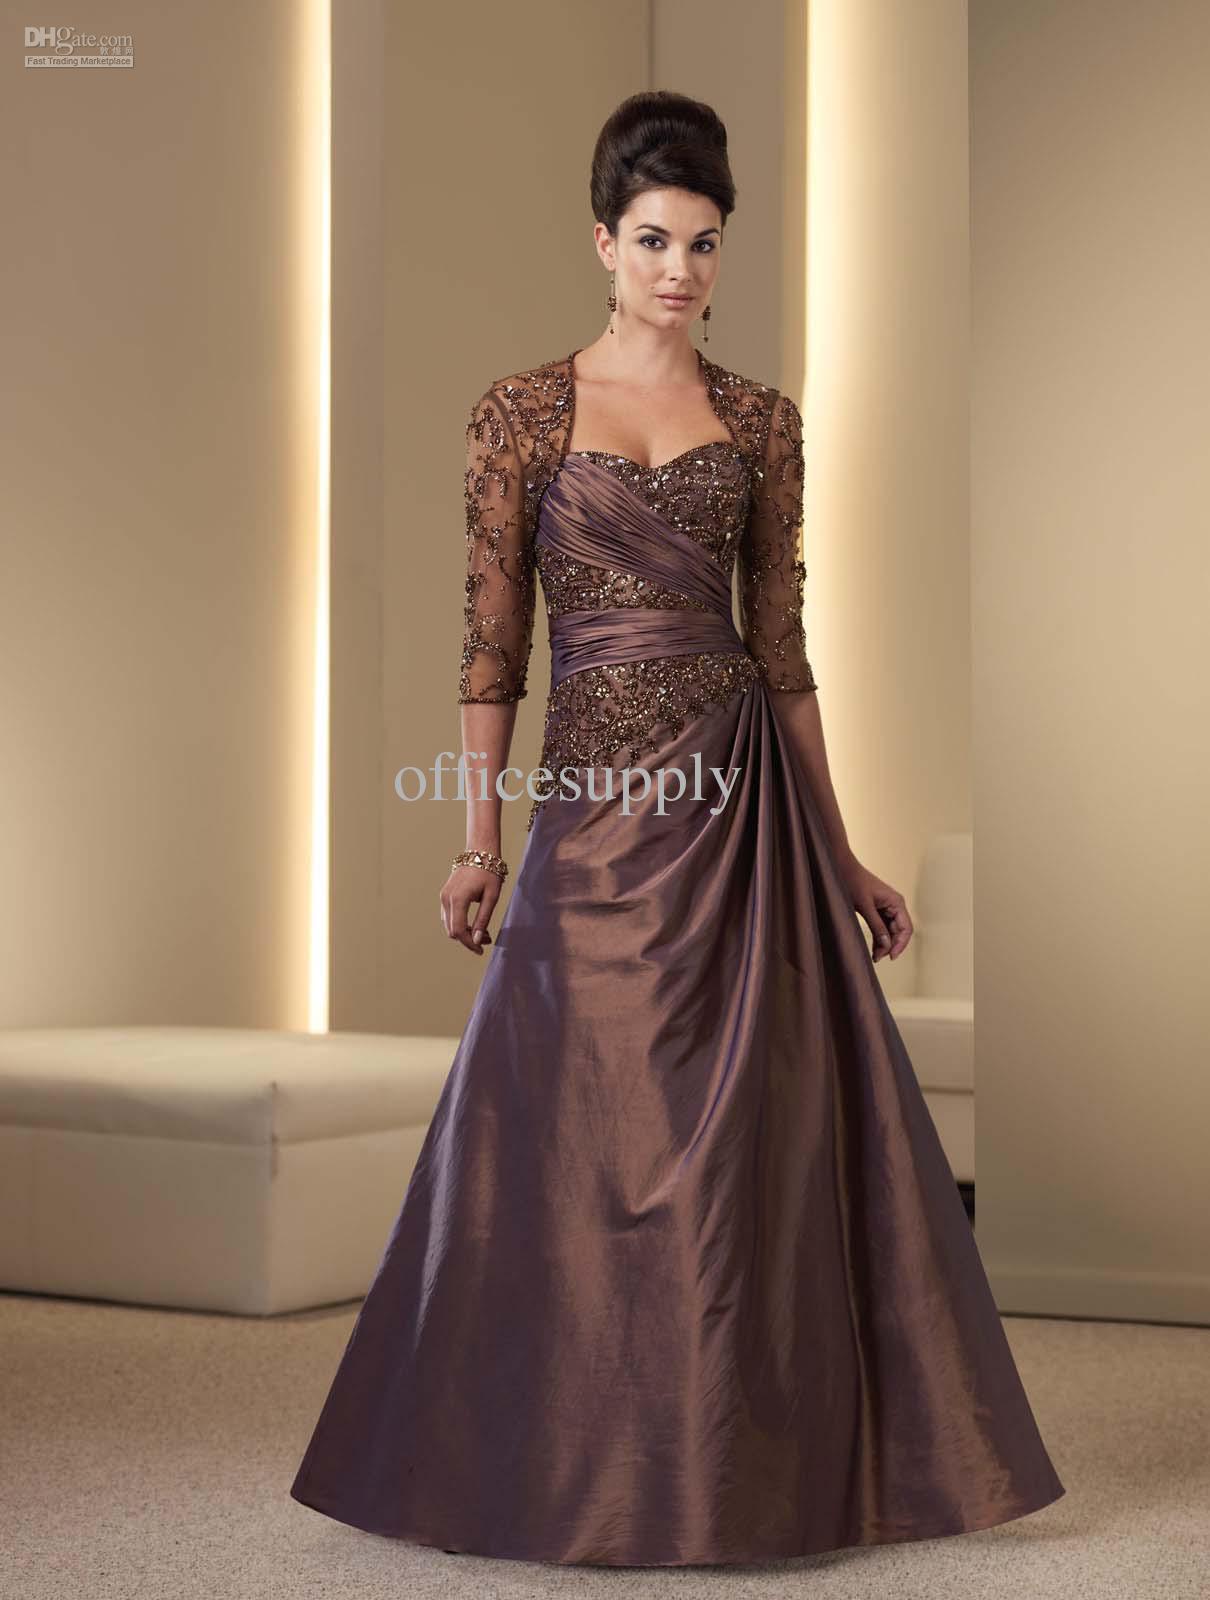 Designer mother of the bride dresses for beach wedding for Mother of bride beach wedding dress